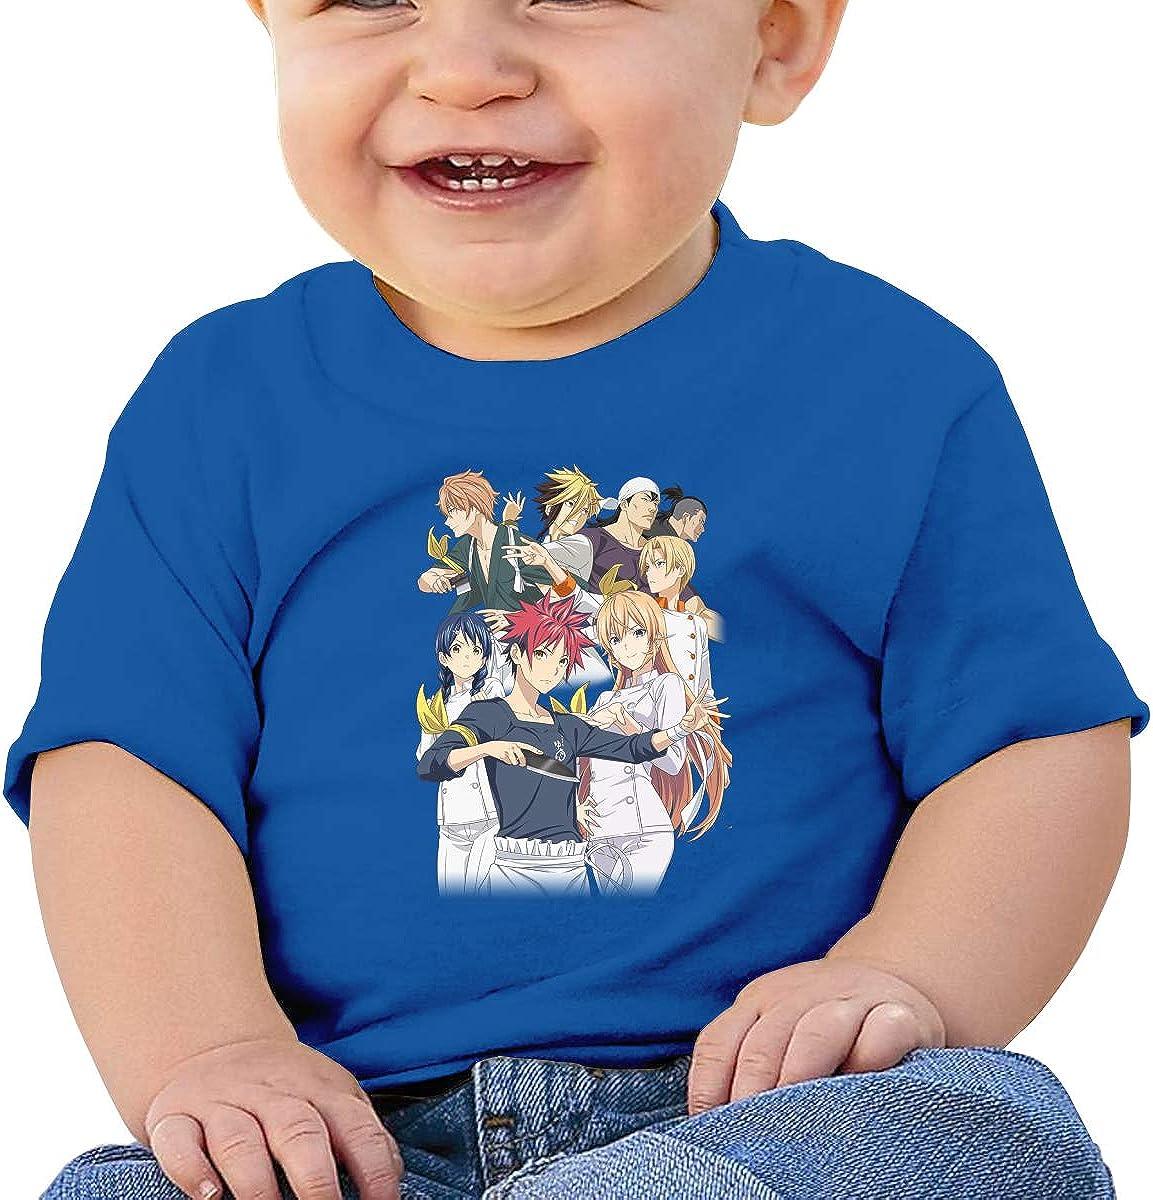 LIIREN Shokugeki No Soma Tee Design Summer T-Shirts for Baby Boy Black